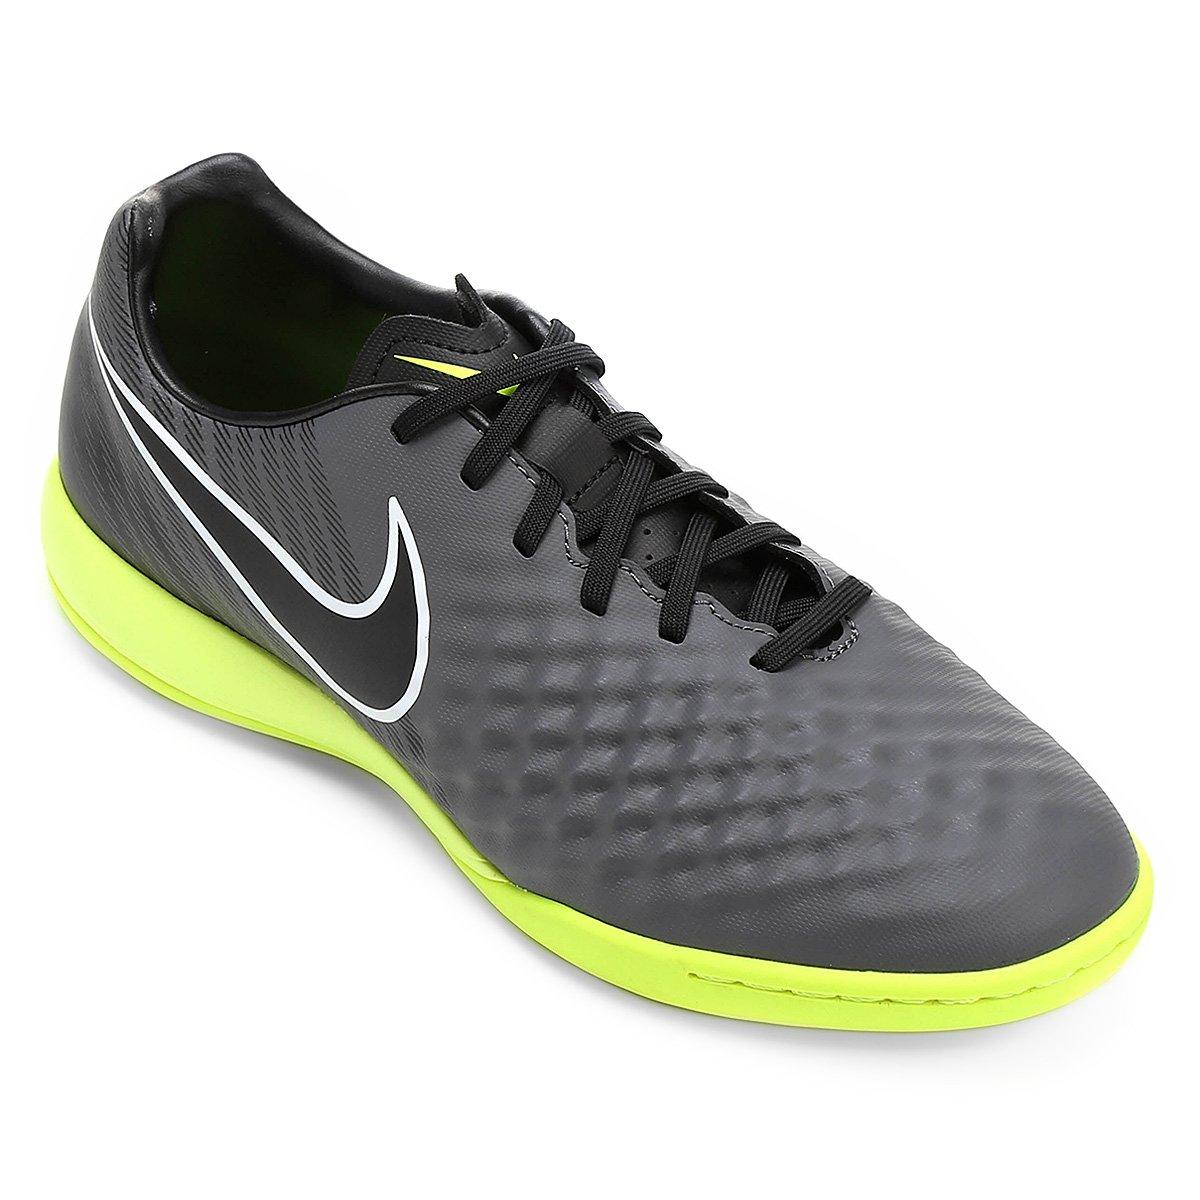 Chuteira Futsal Nike Magista Onda II IC Masculina - Chumbo e Verde ... 0848f39229f6a